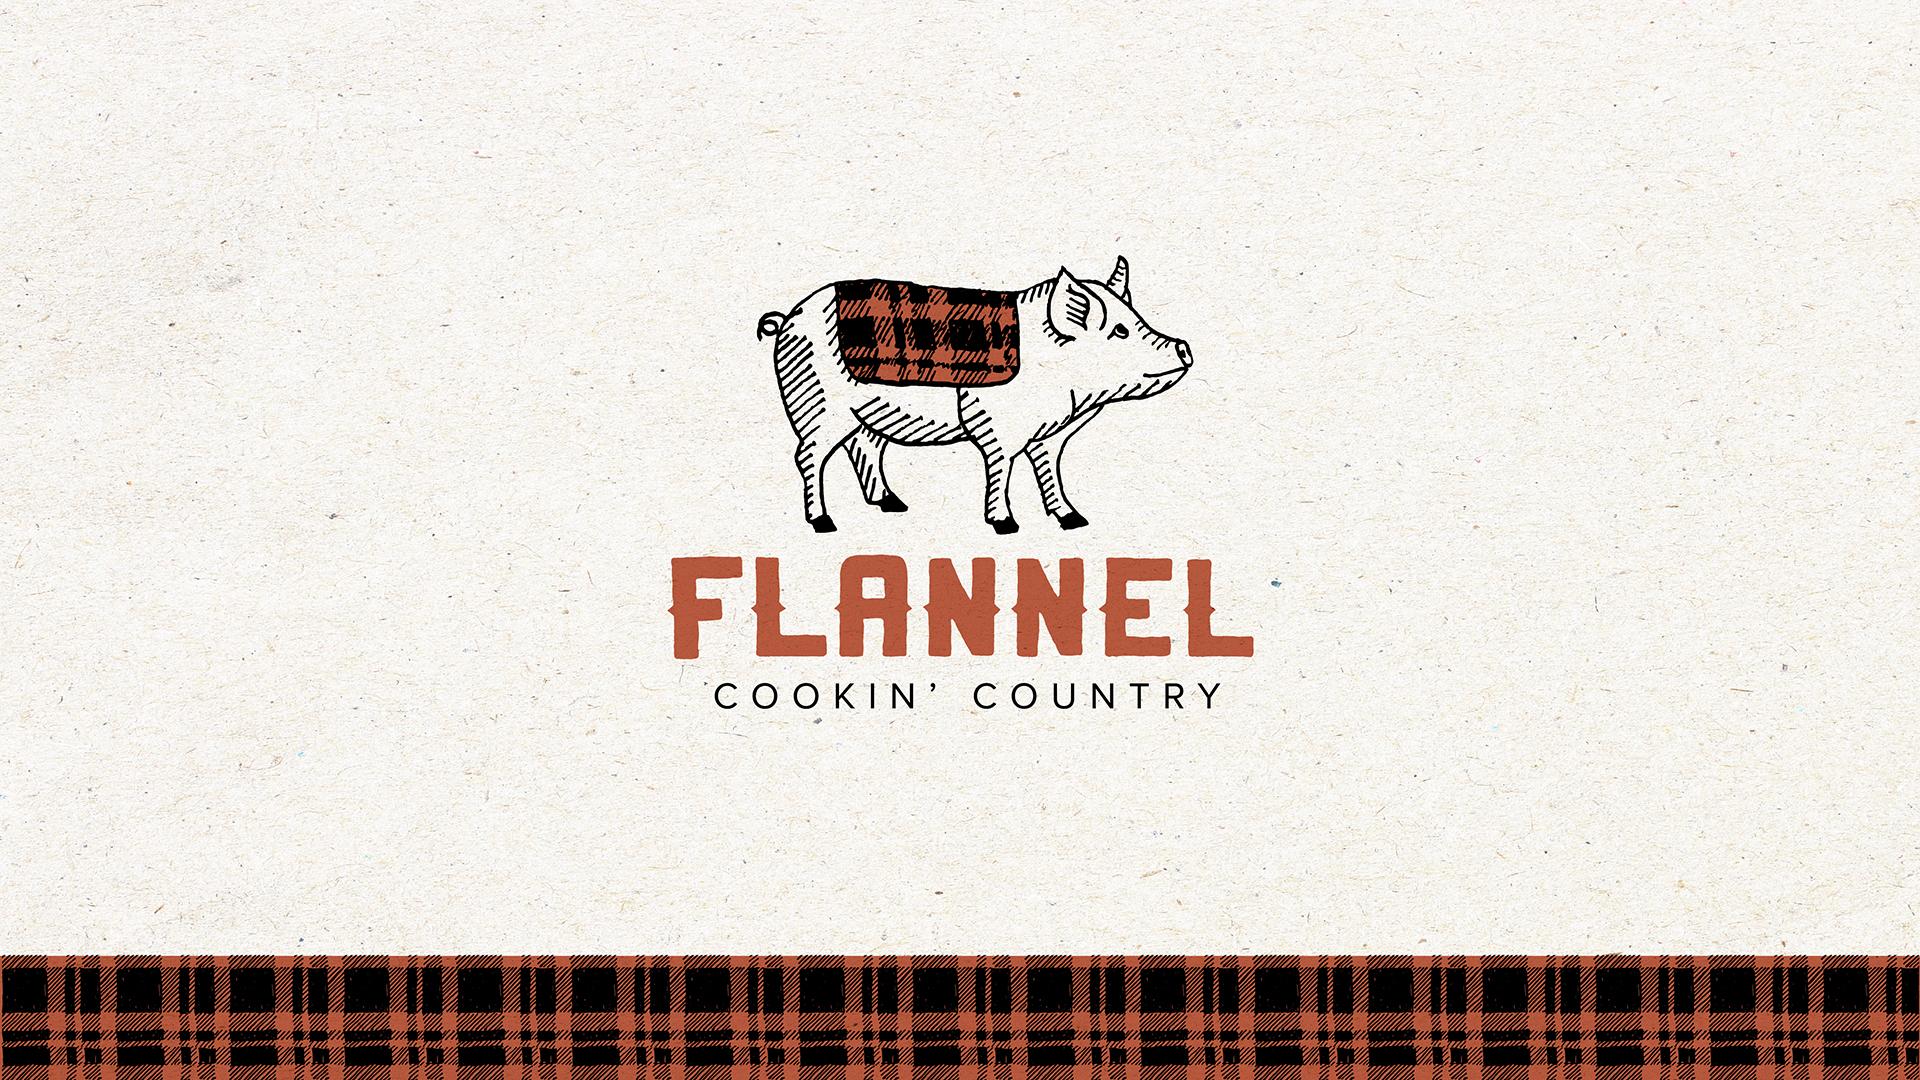 Flannel_logos_mockups_012519-01.jpg